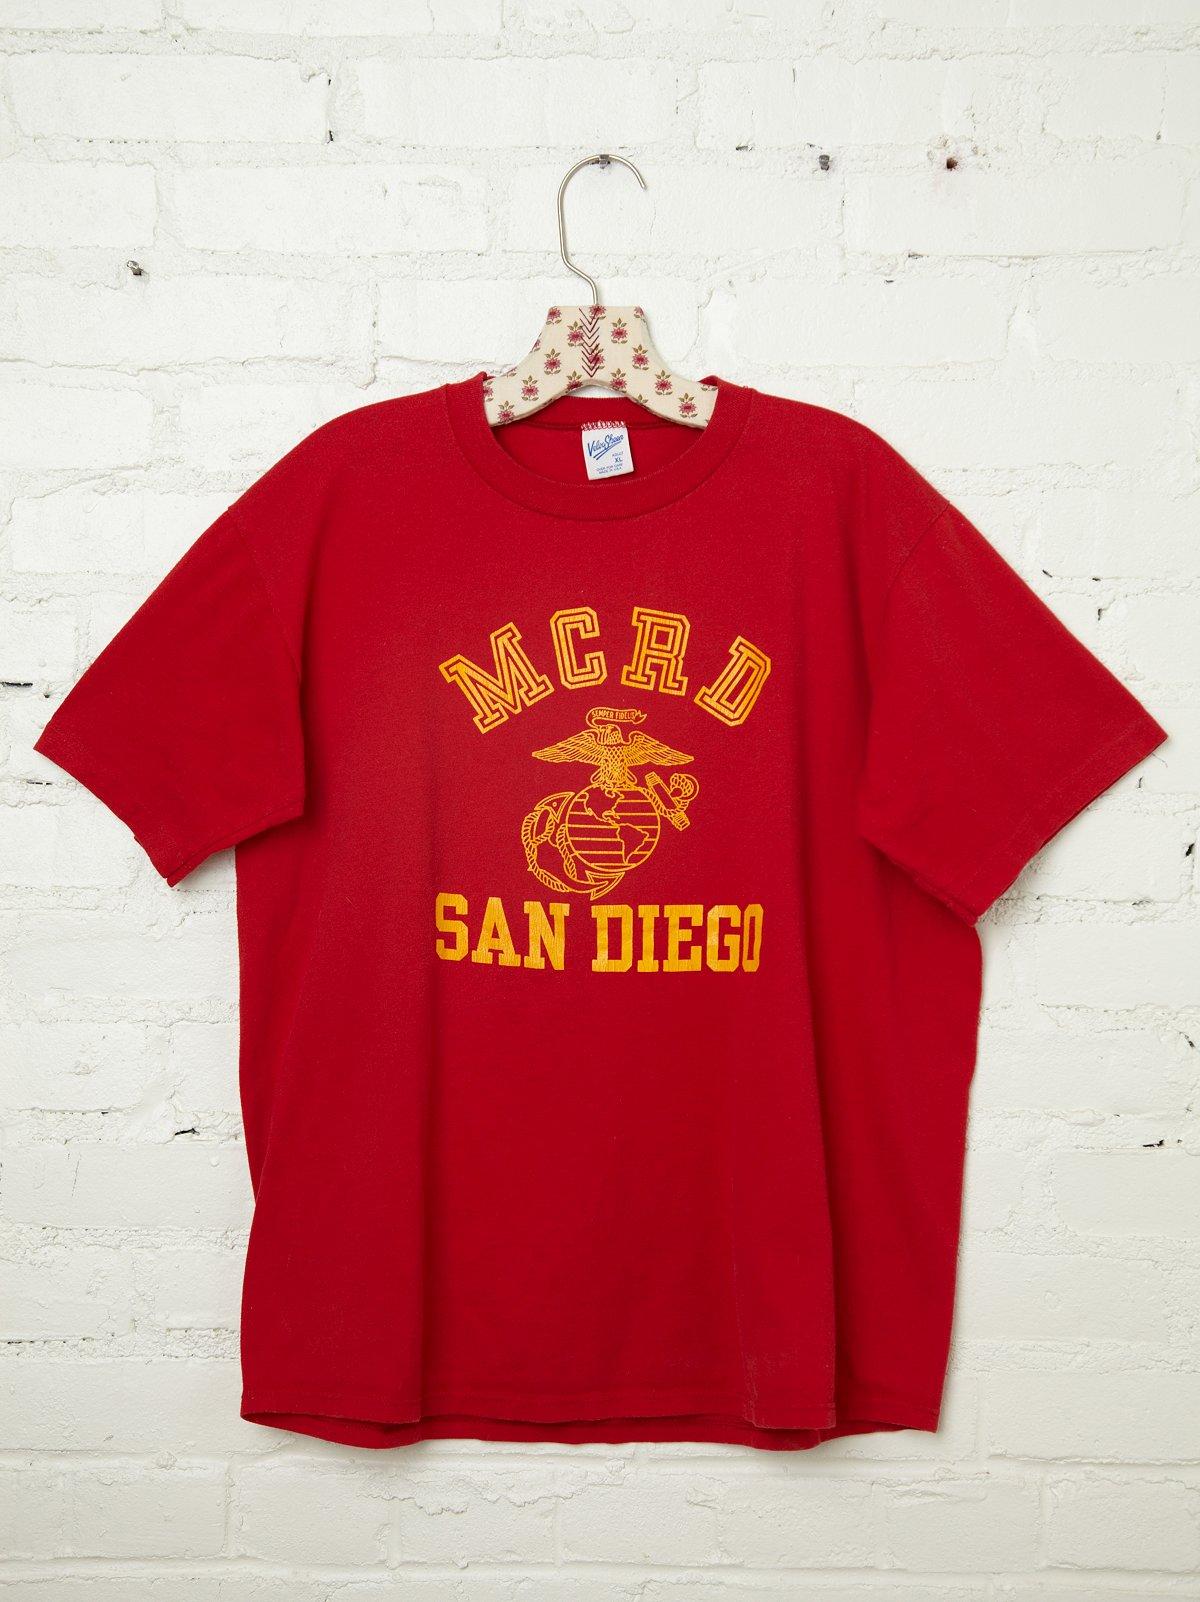 Vintage MCRD San Diego Tee